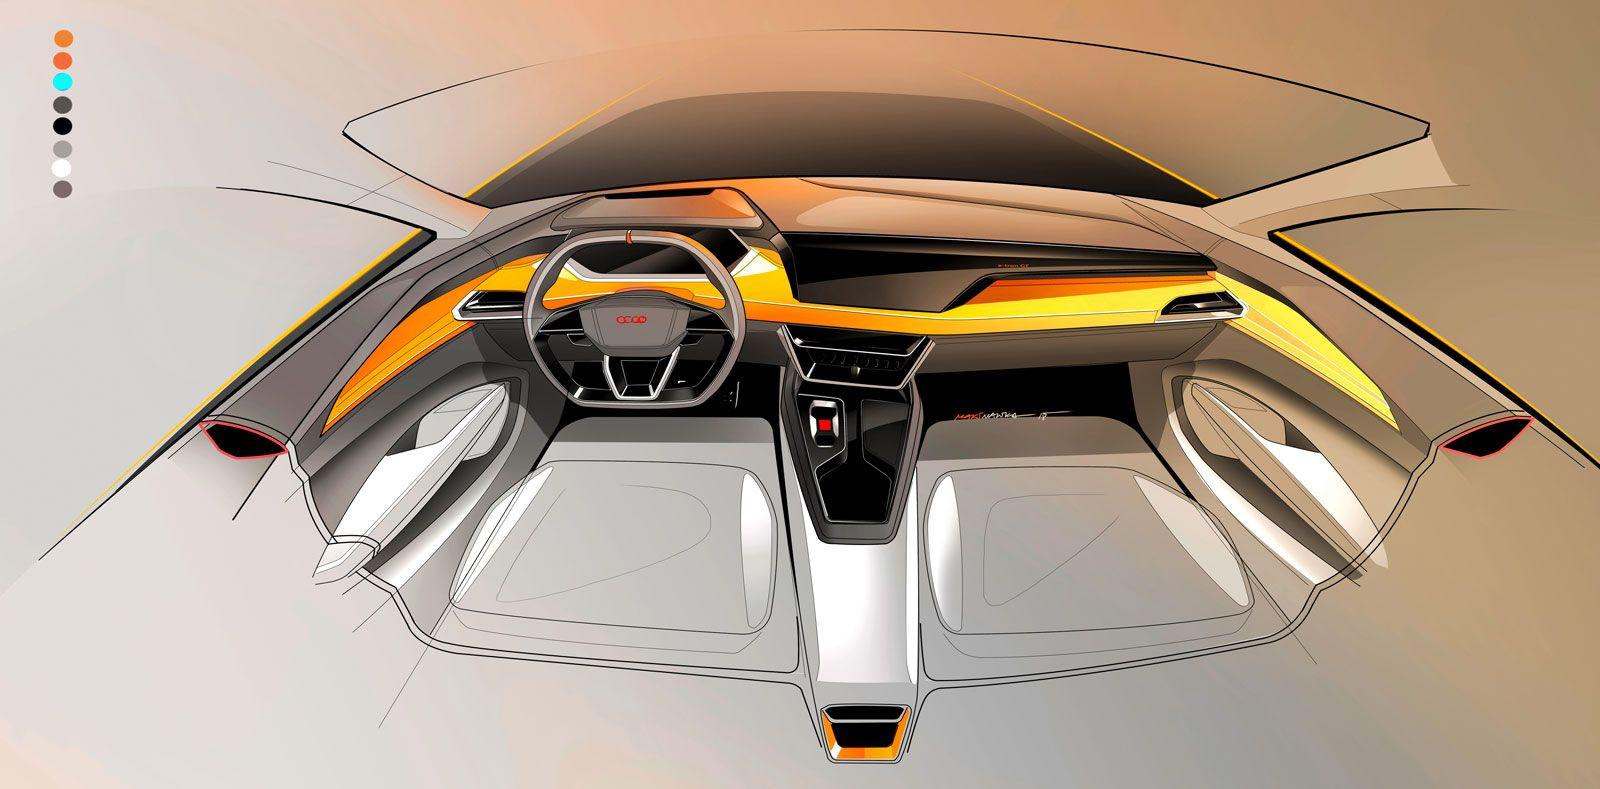 Audi E Tron Gt Concept Interior Design Sketch Render Car Body Design In 2020 Car Interior Design Sketch Interior Design Sketch Concept Car Interior Design